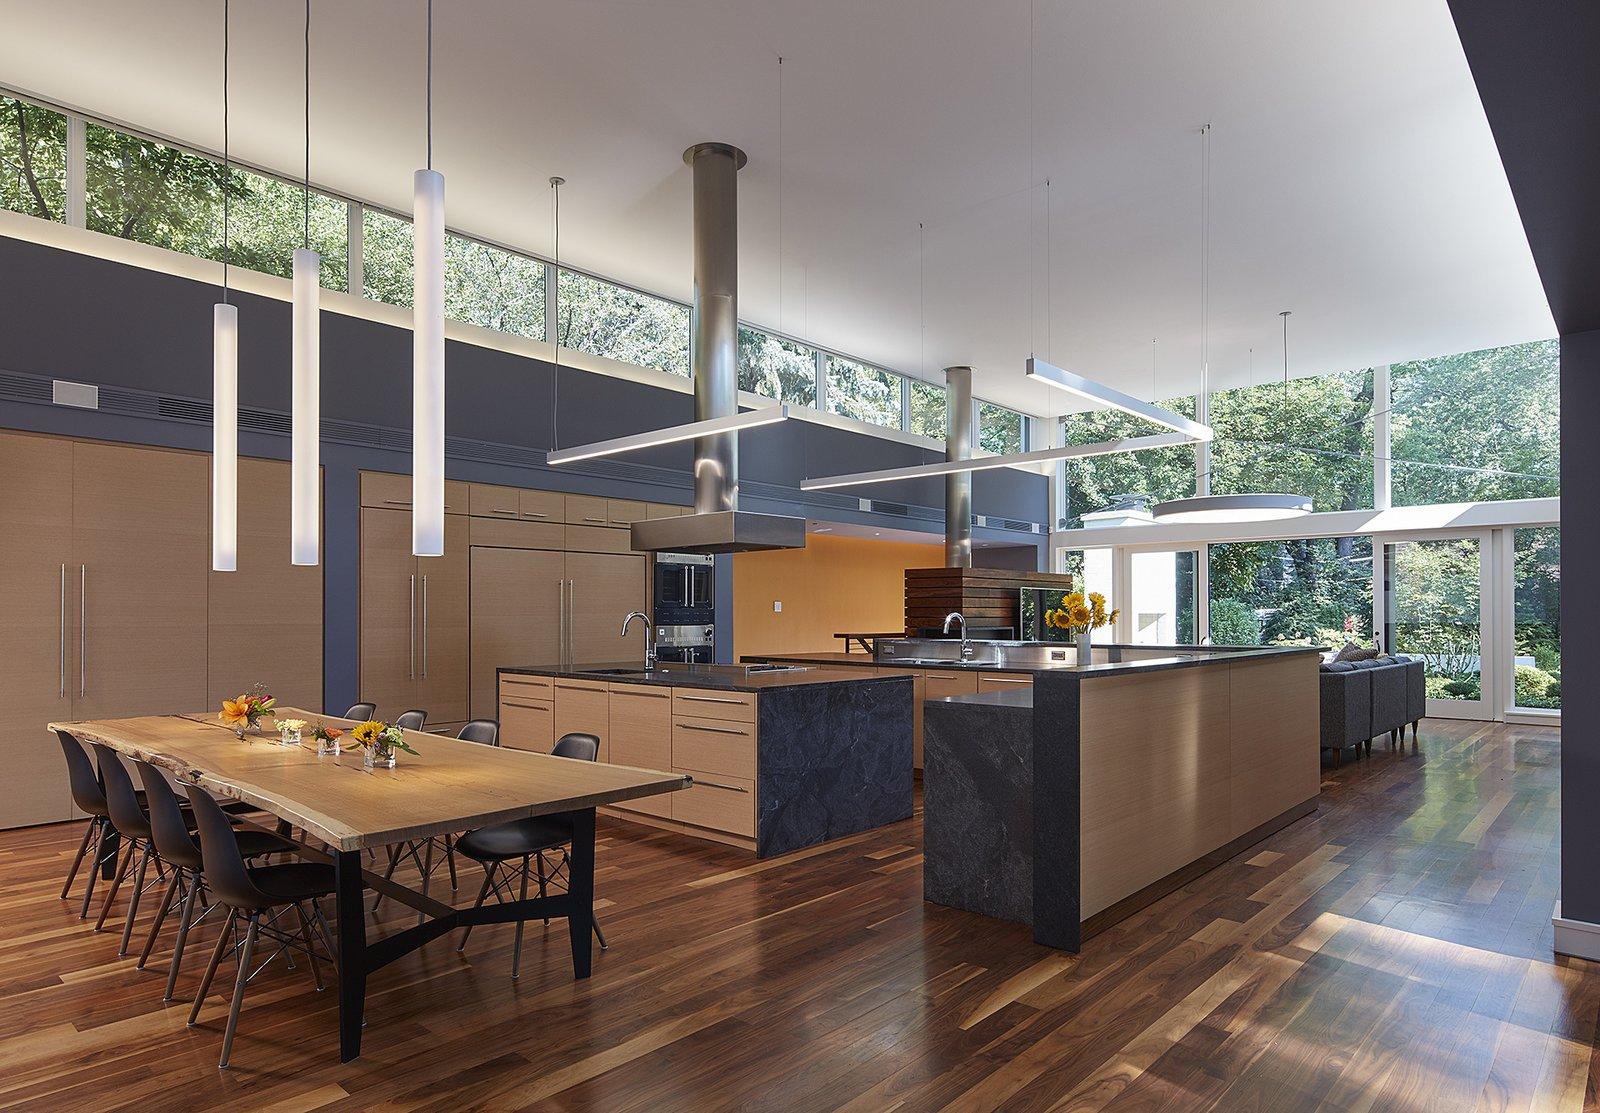 Downers Grove Kitchen.jpg